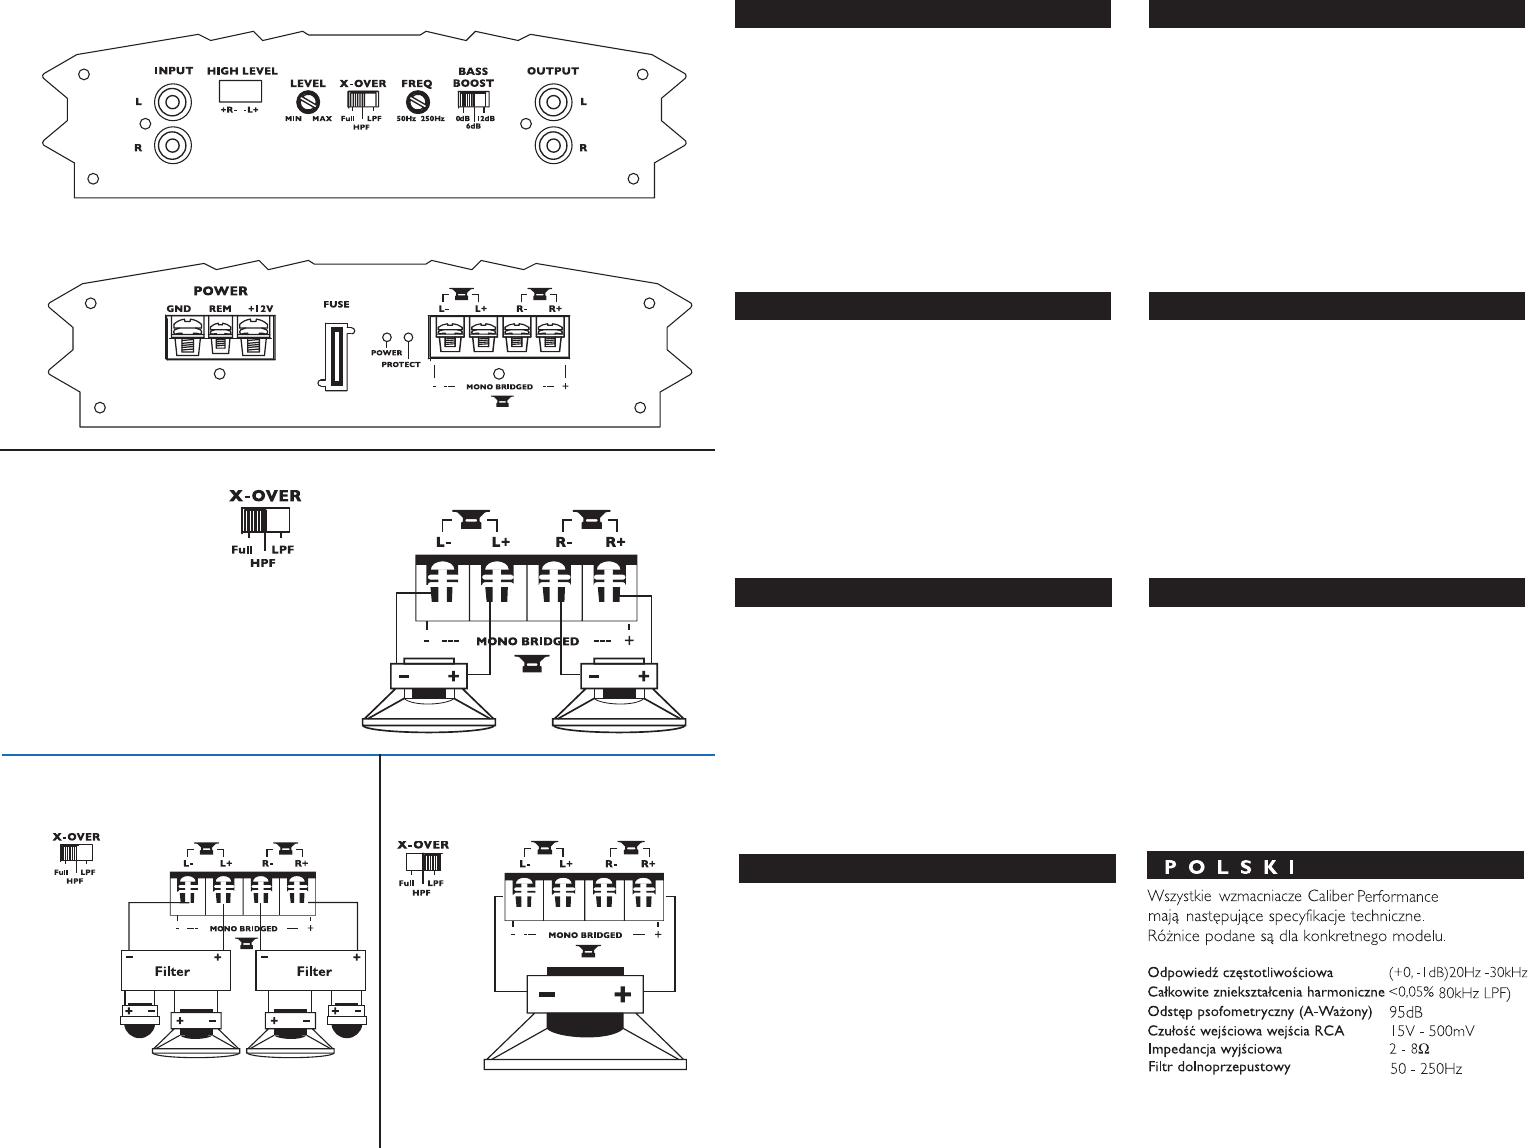 Handleiding Caliber ca 110 2 (pagina 1 van 13) (Deutsch, English ...